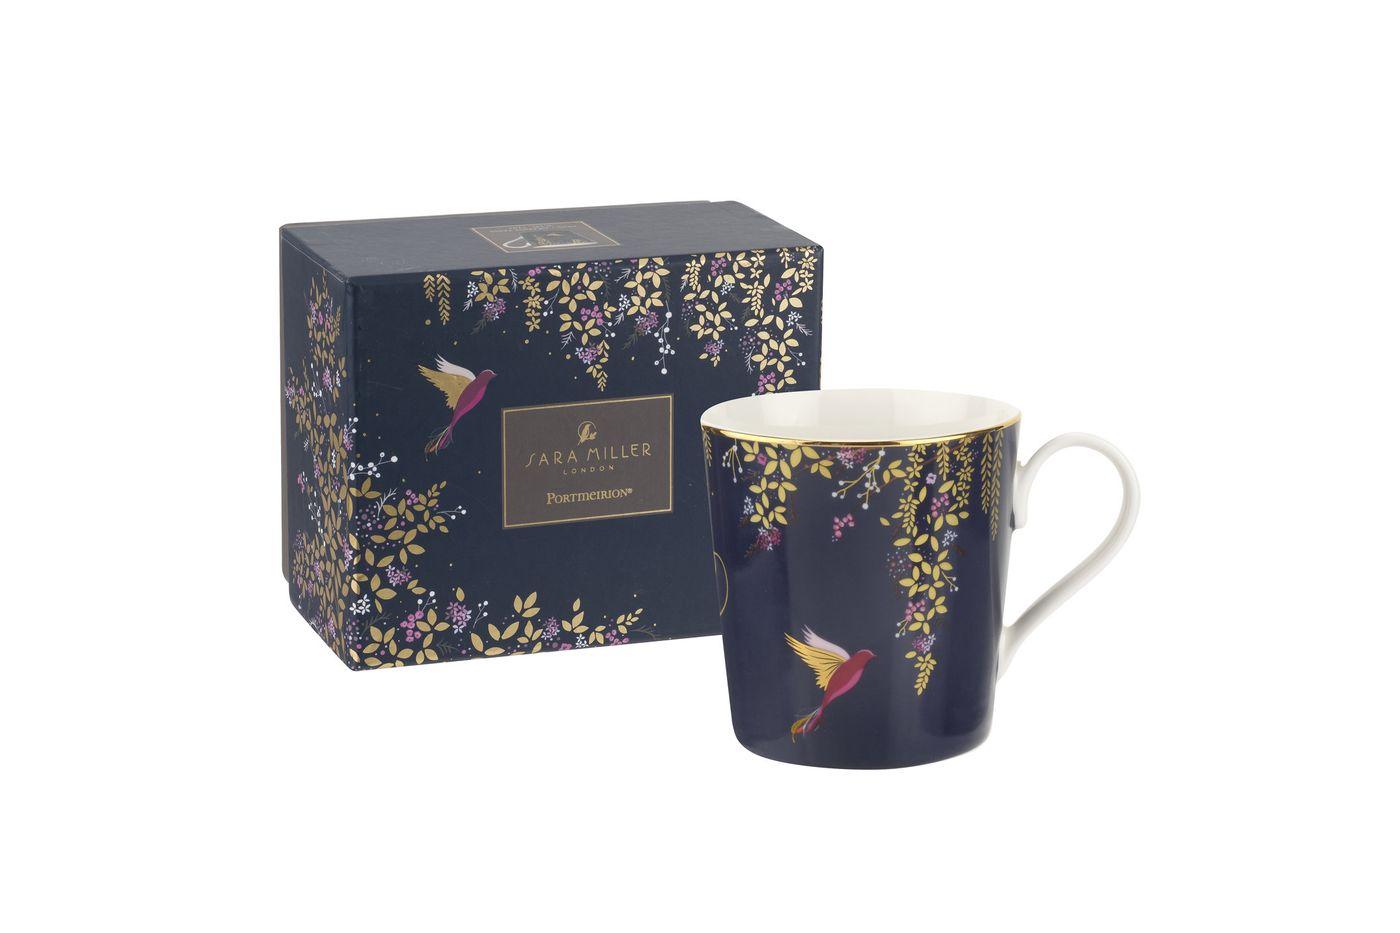 Sara Miller London for Portmeirion Chelsea Collection Mug Navy 0.34l thumb 2